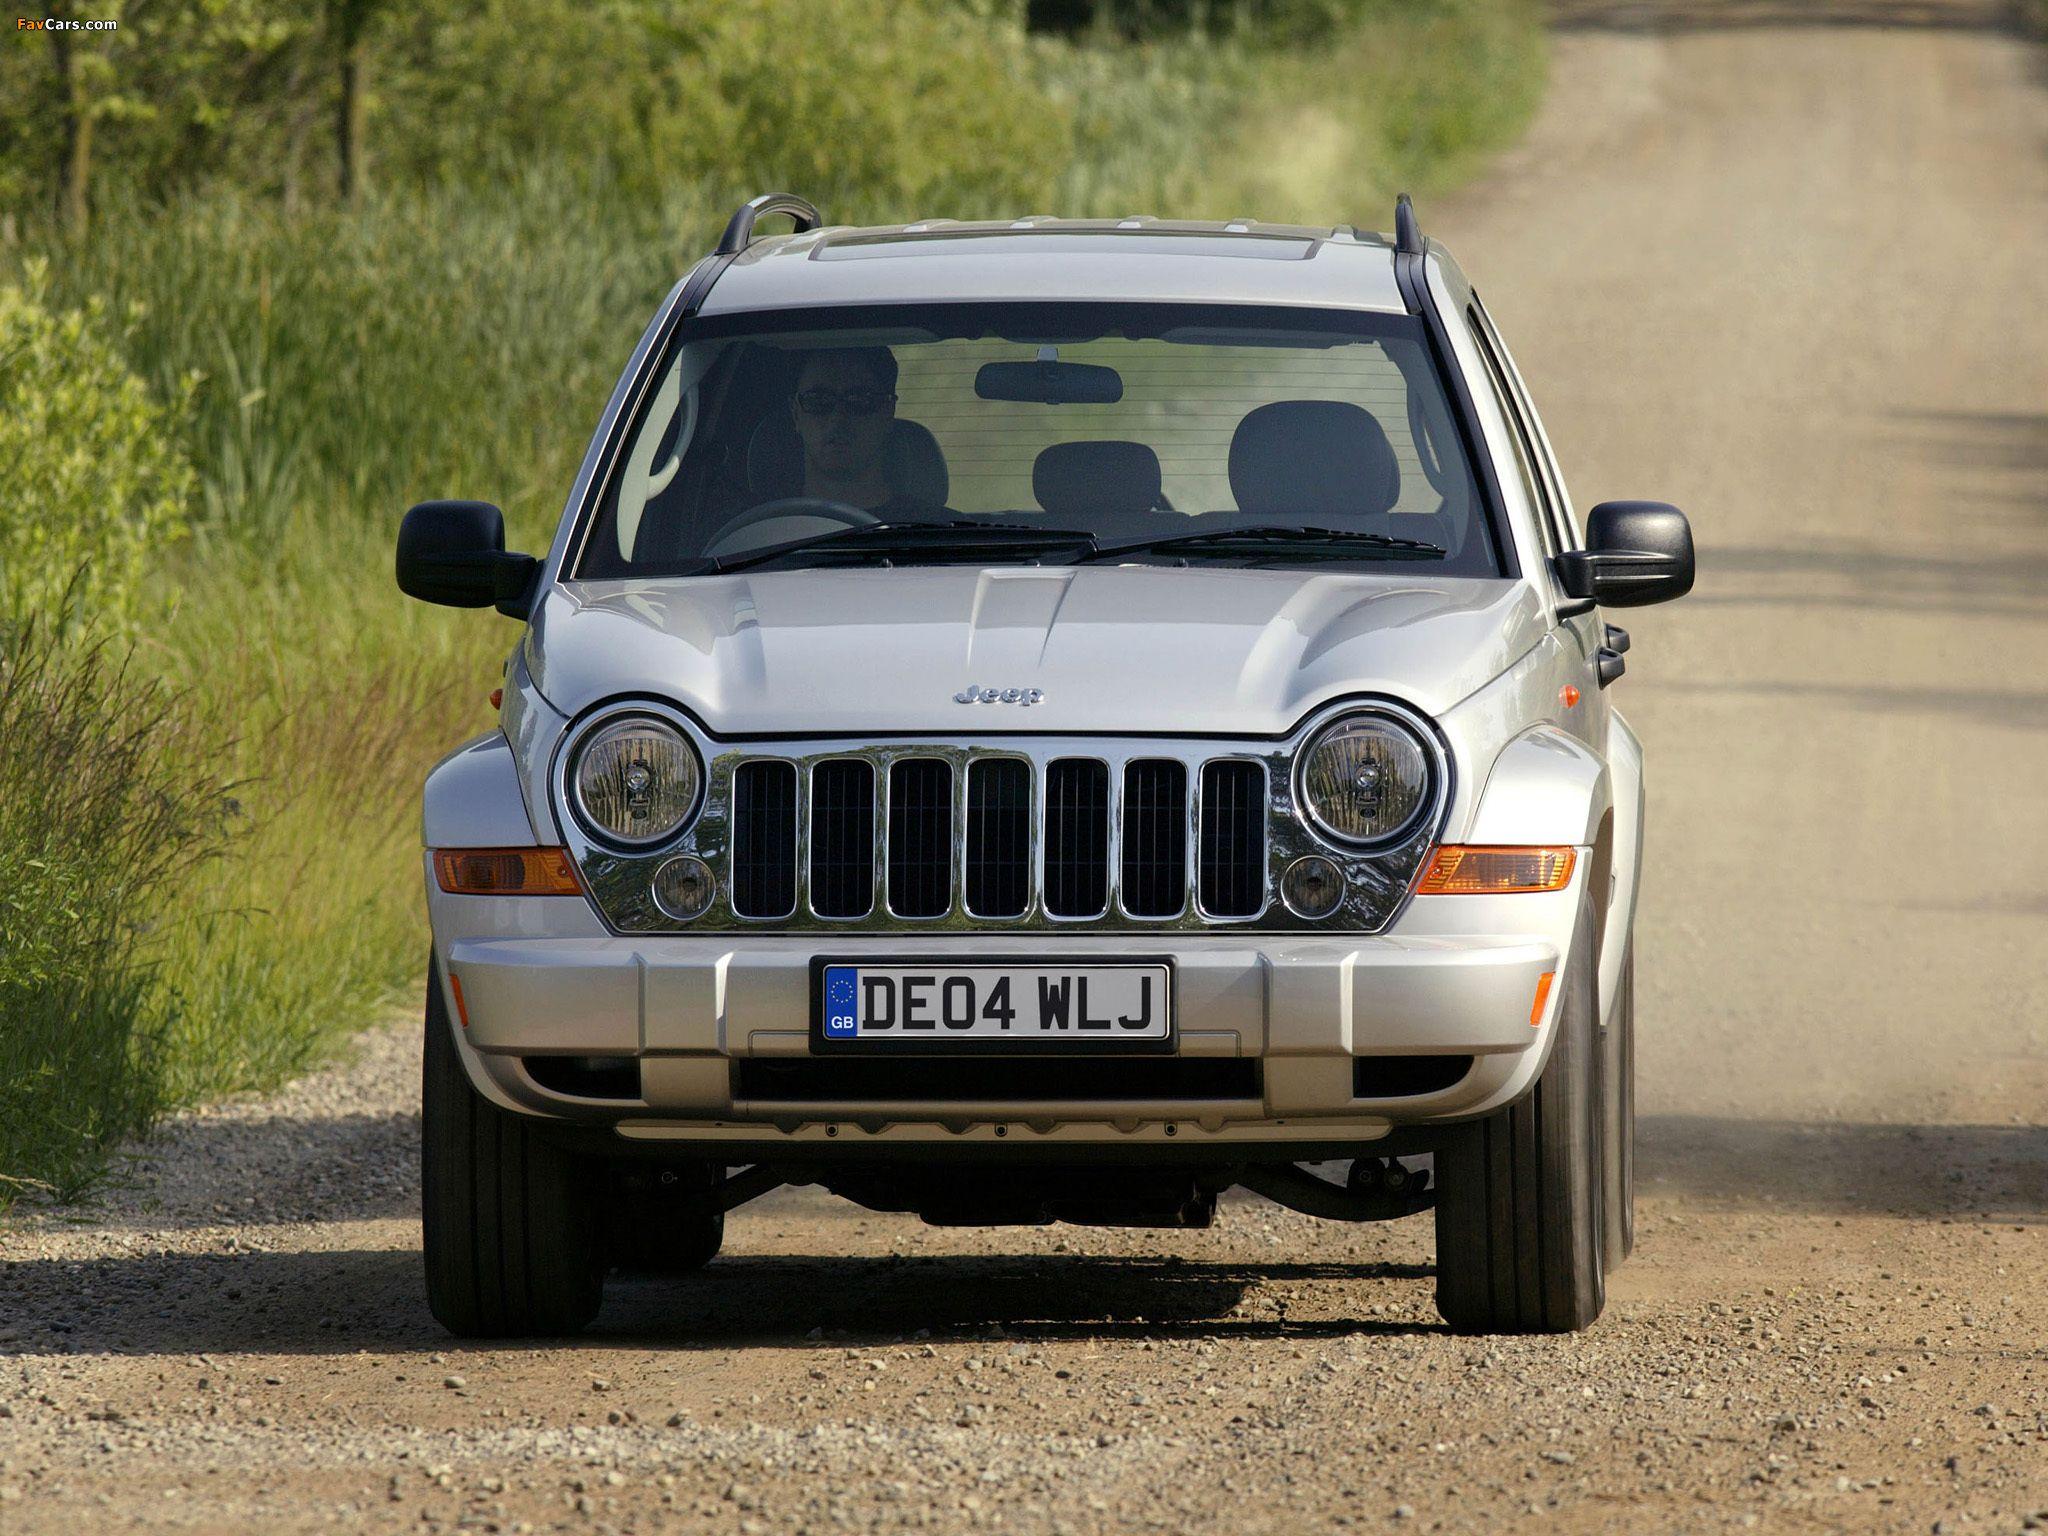 Jeep Cherokee Limited UKspec (KJ) 200507 pictures